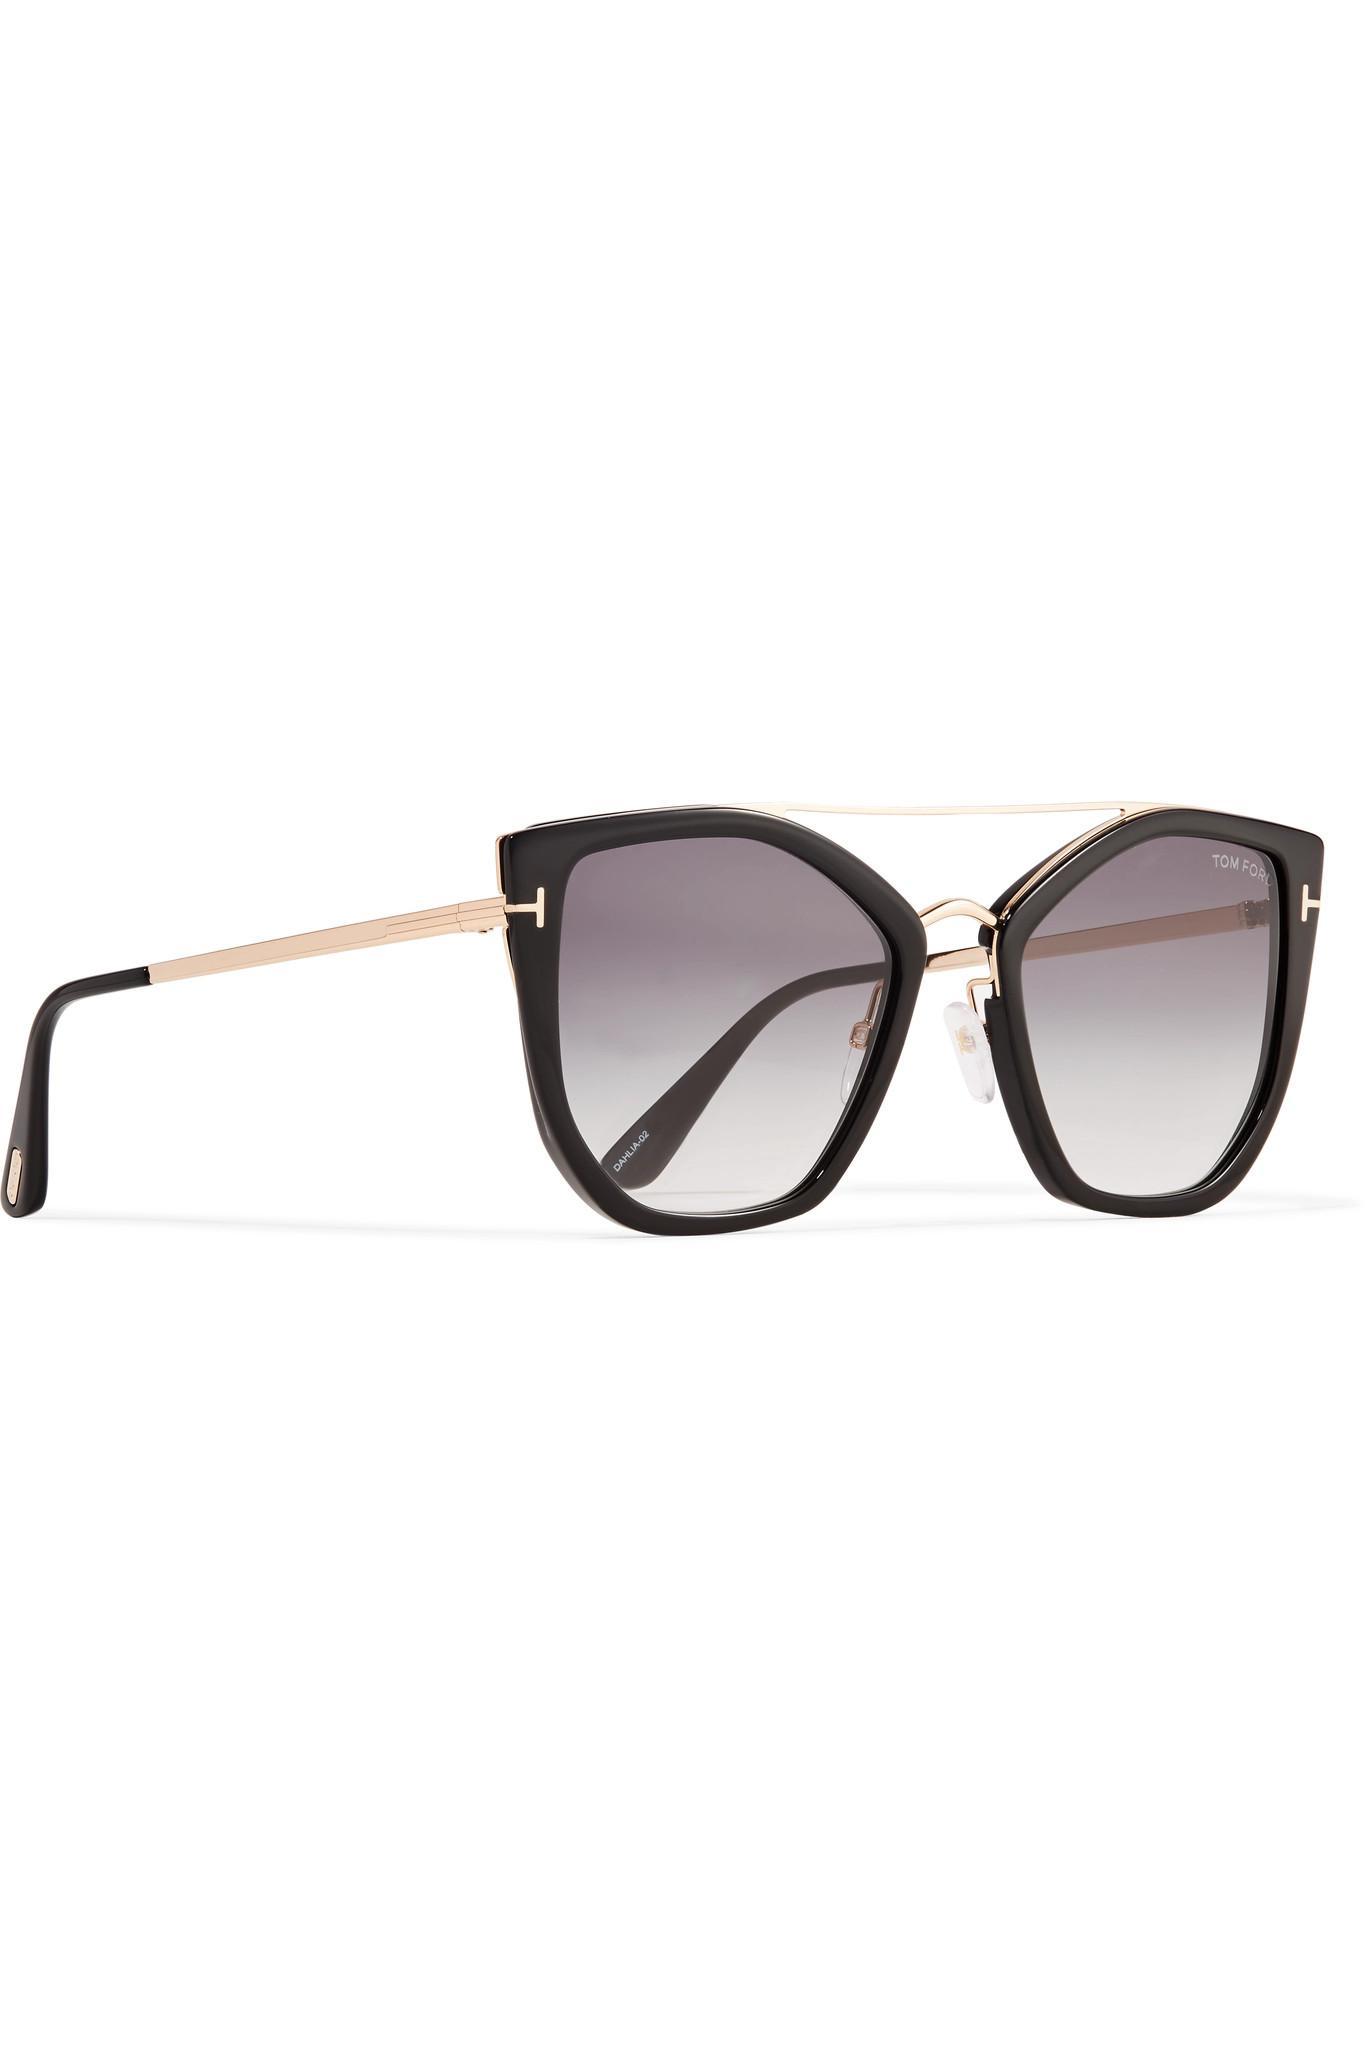 1aa059200d2e Tom Ford - Black Dahlia Cat-eye Acetate And Gold-tone Sunglasses - Lyst.  View fullscreen